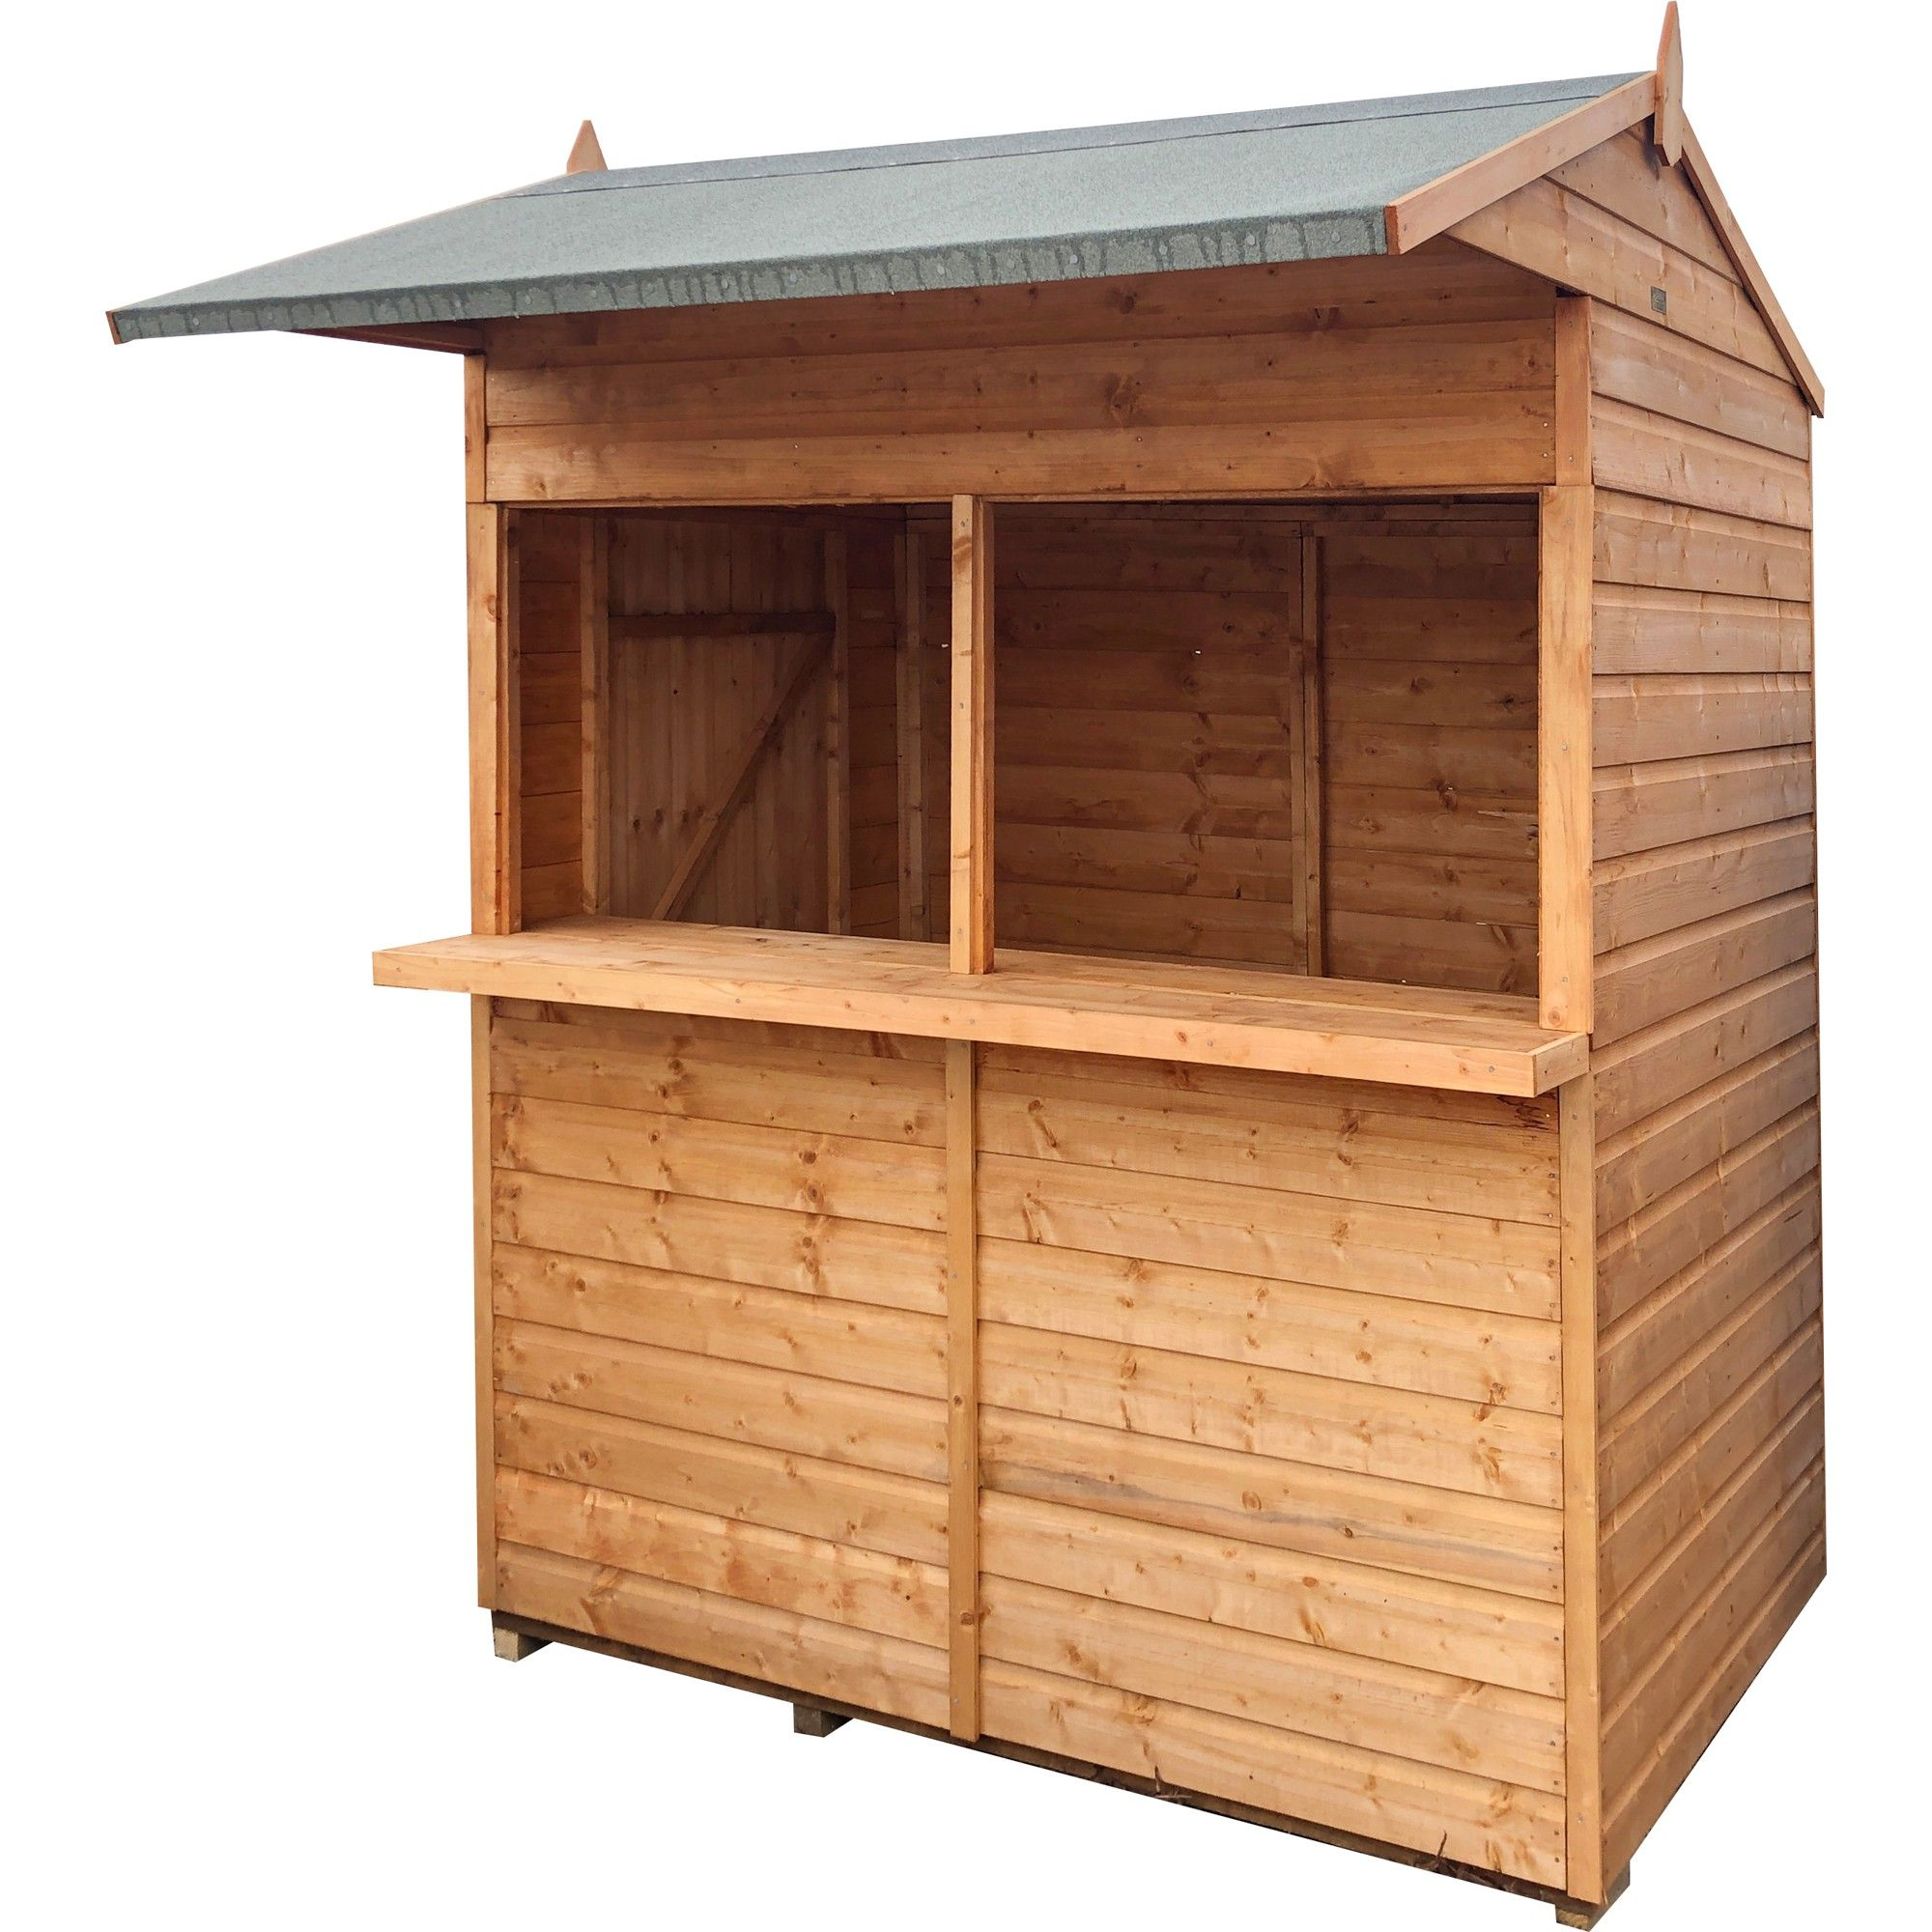 Rowlinson Celebrity Wooden Garden Bar Amp Shed Bar Shed Garden Bar Shed Garden Bar